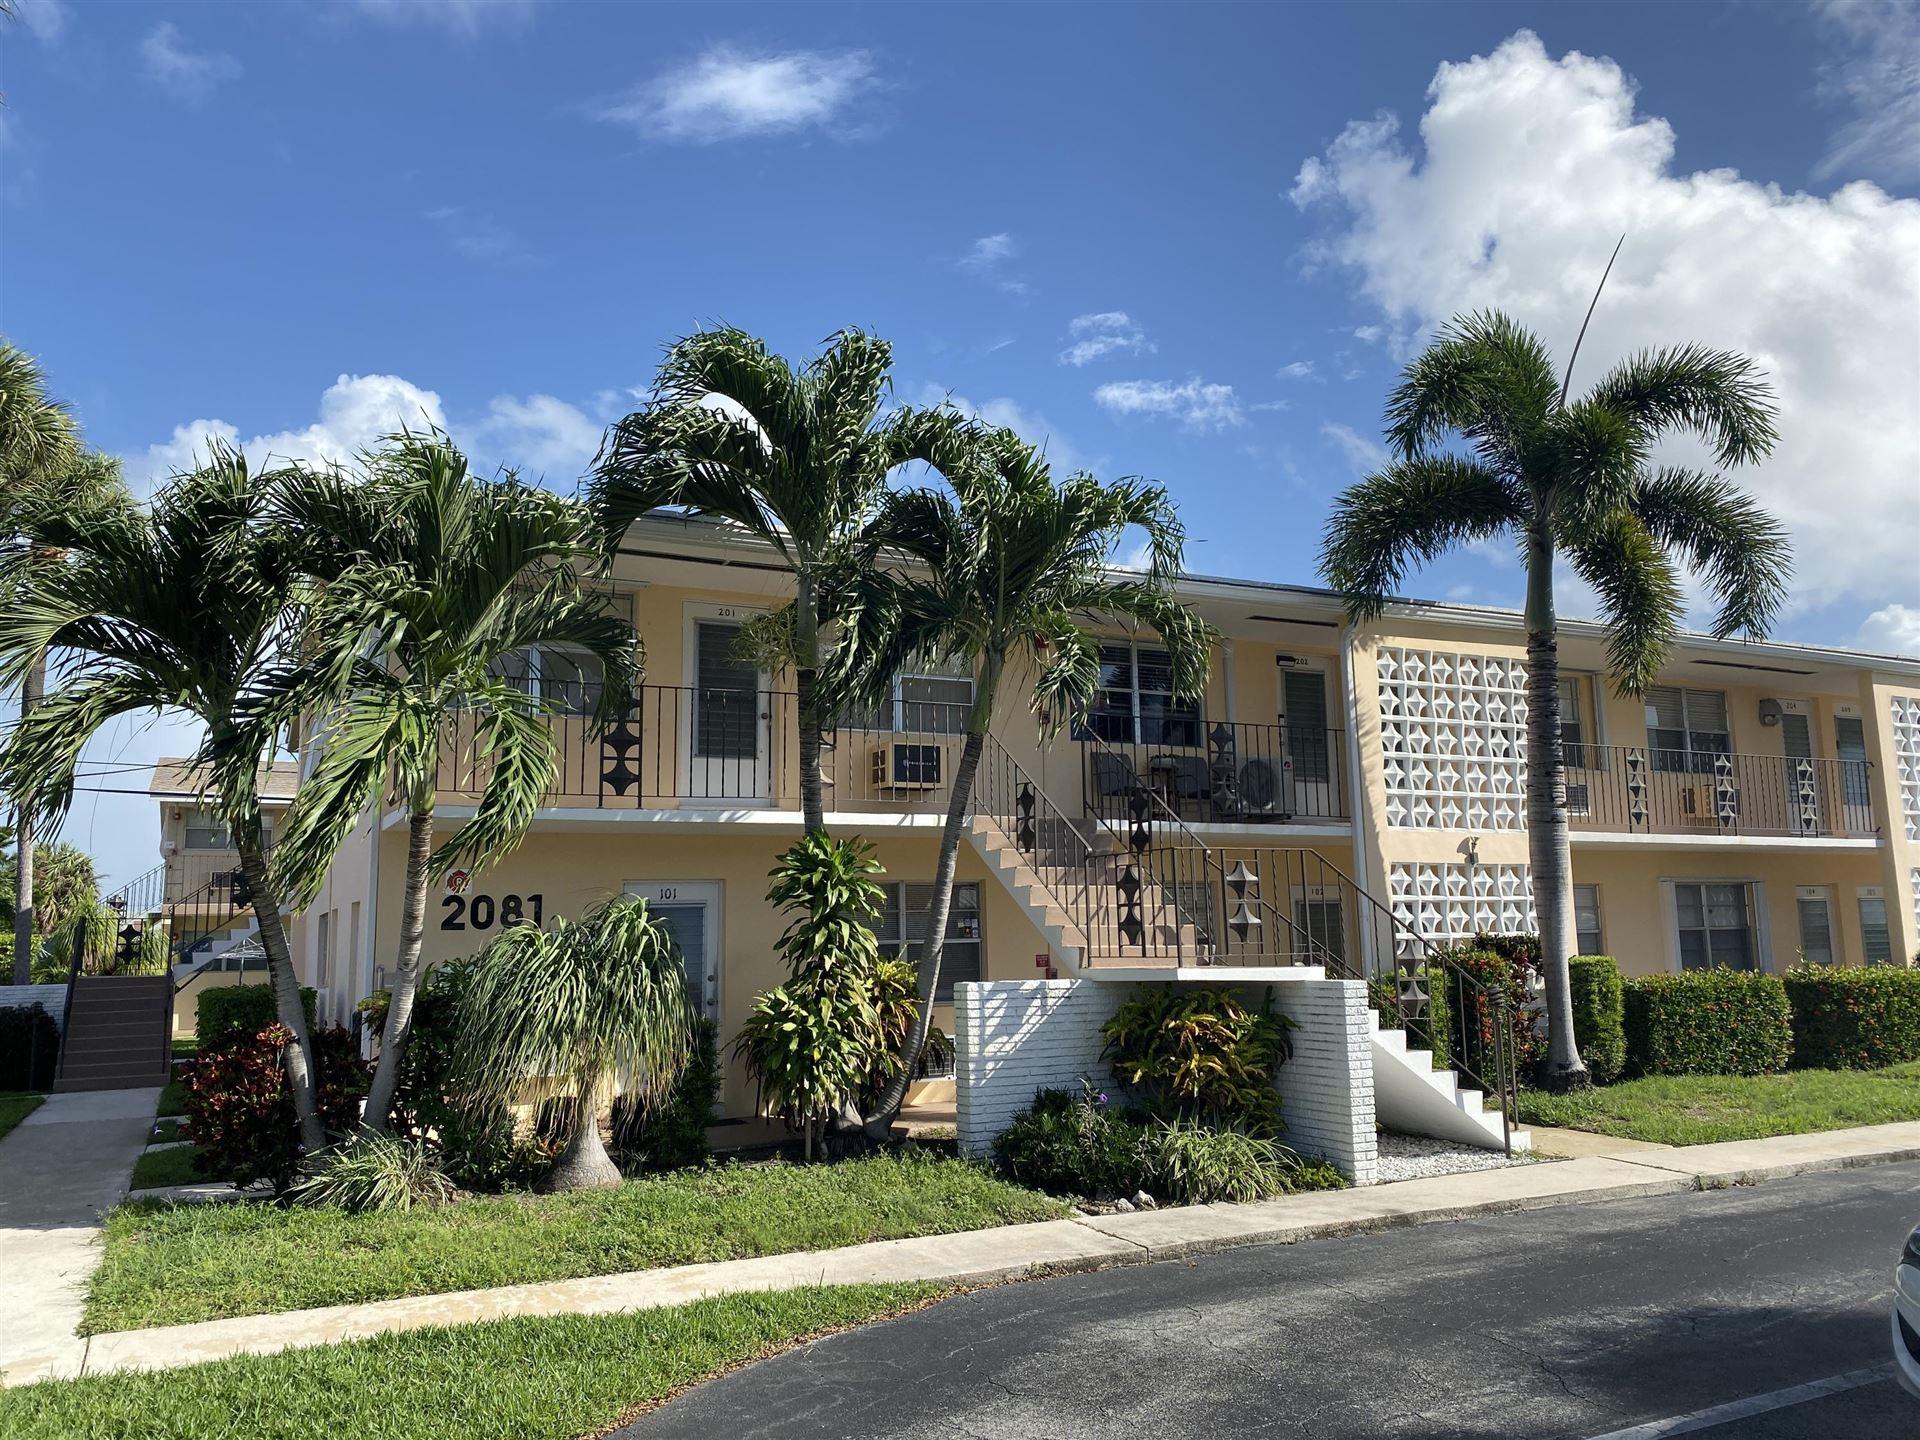 2081 NE 56th Street #207, Fort Lauderdale, FL 33308 - #: RX-10670566